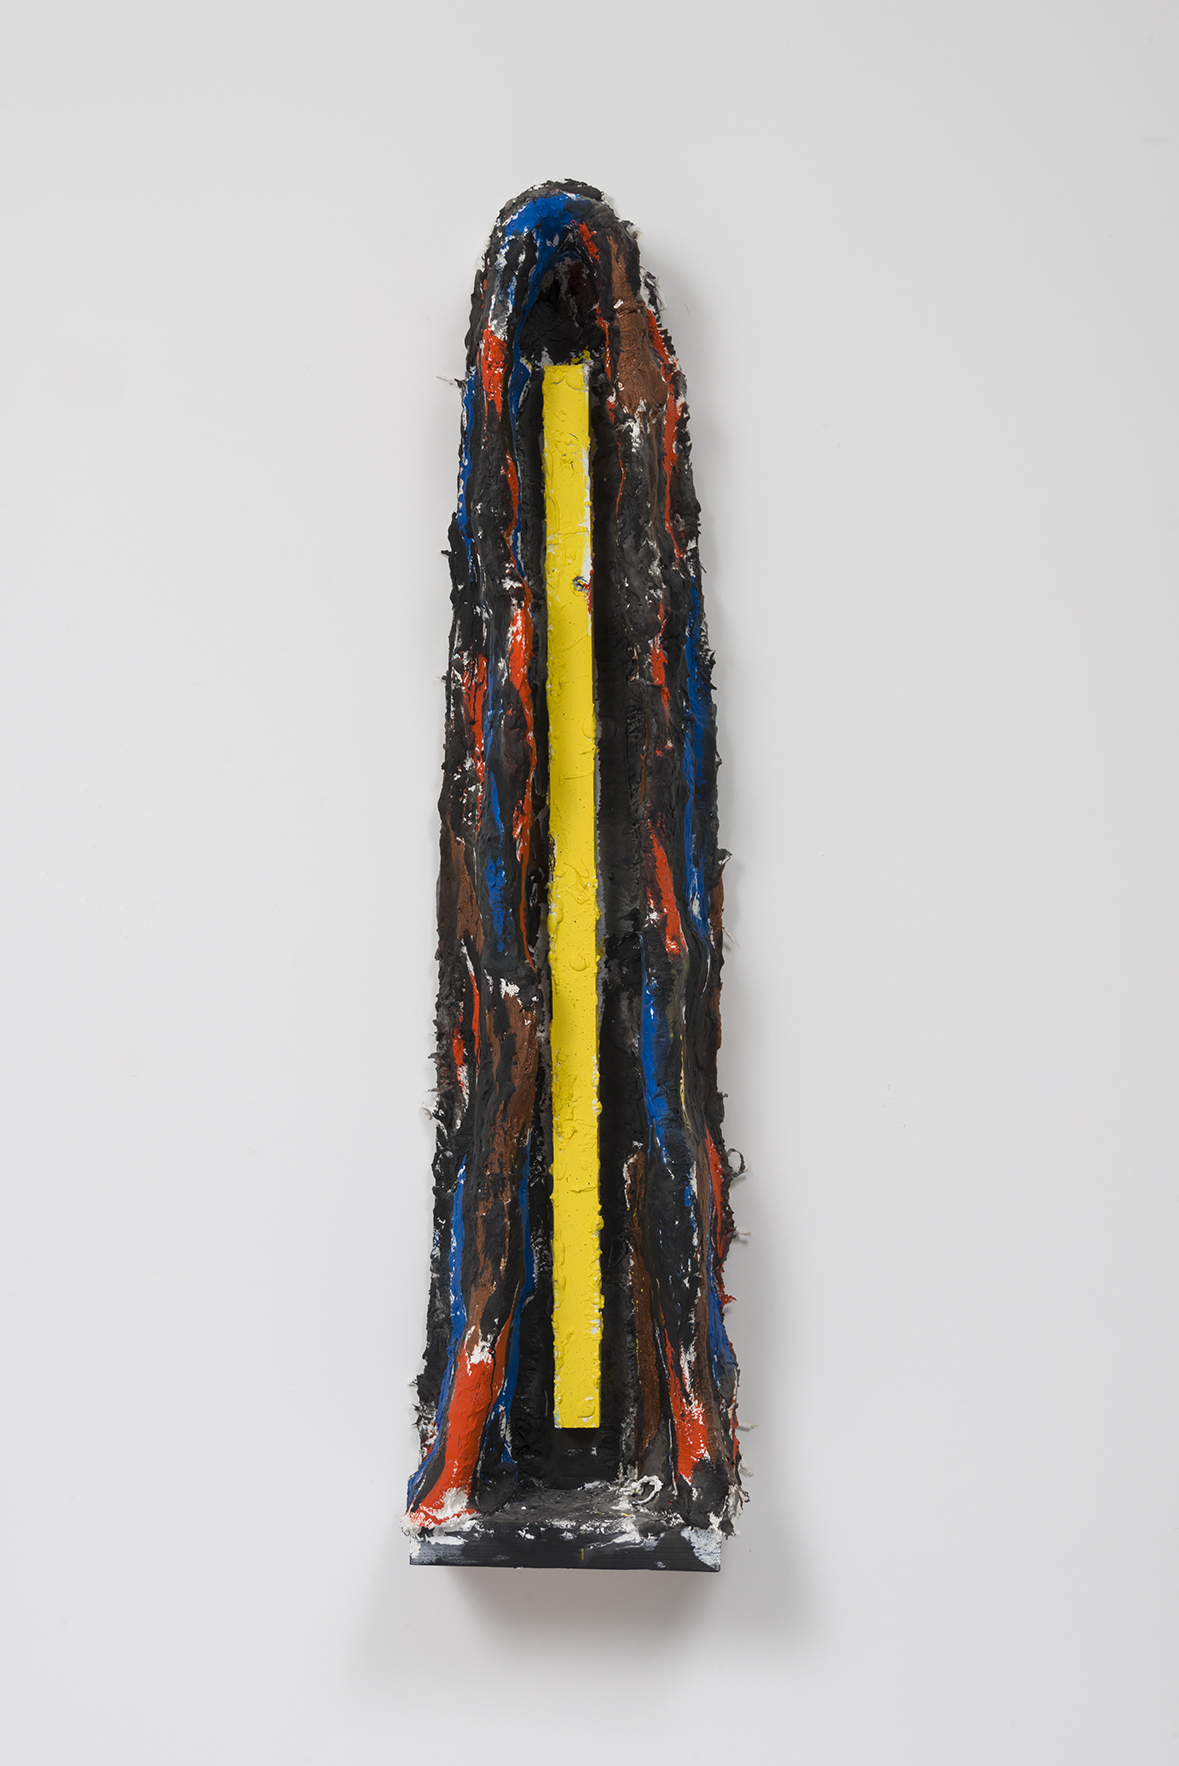 "Florian Morlat - Untitled (Cave 5) - Wood, Plaster, Burlap, Chicken Wire, Oil Enamel - 46 x 11 x 6"""